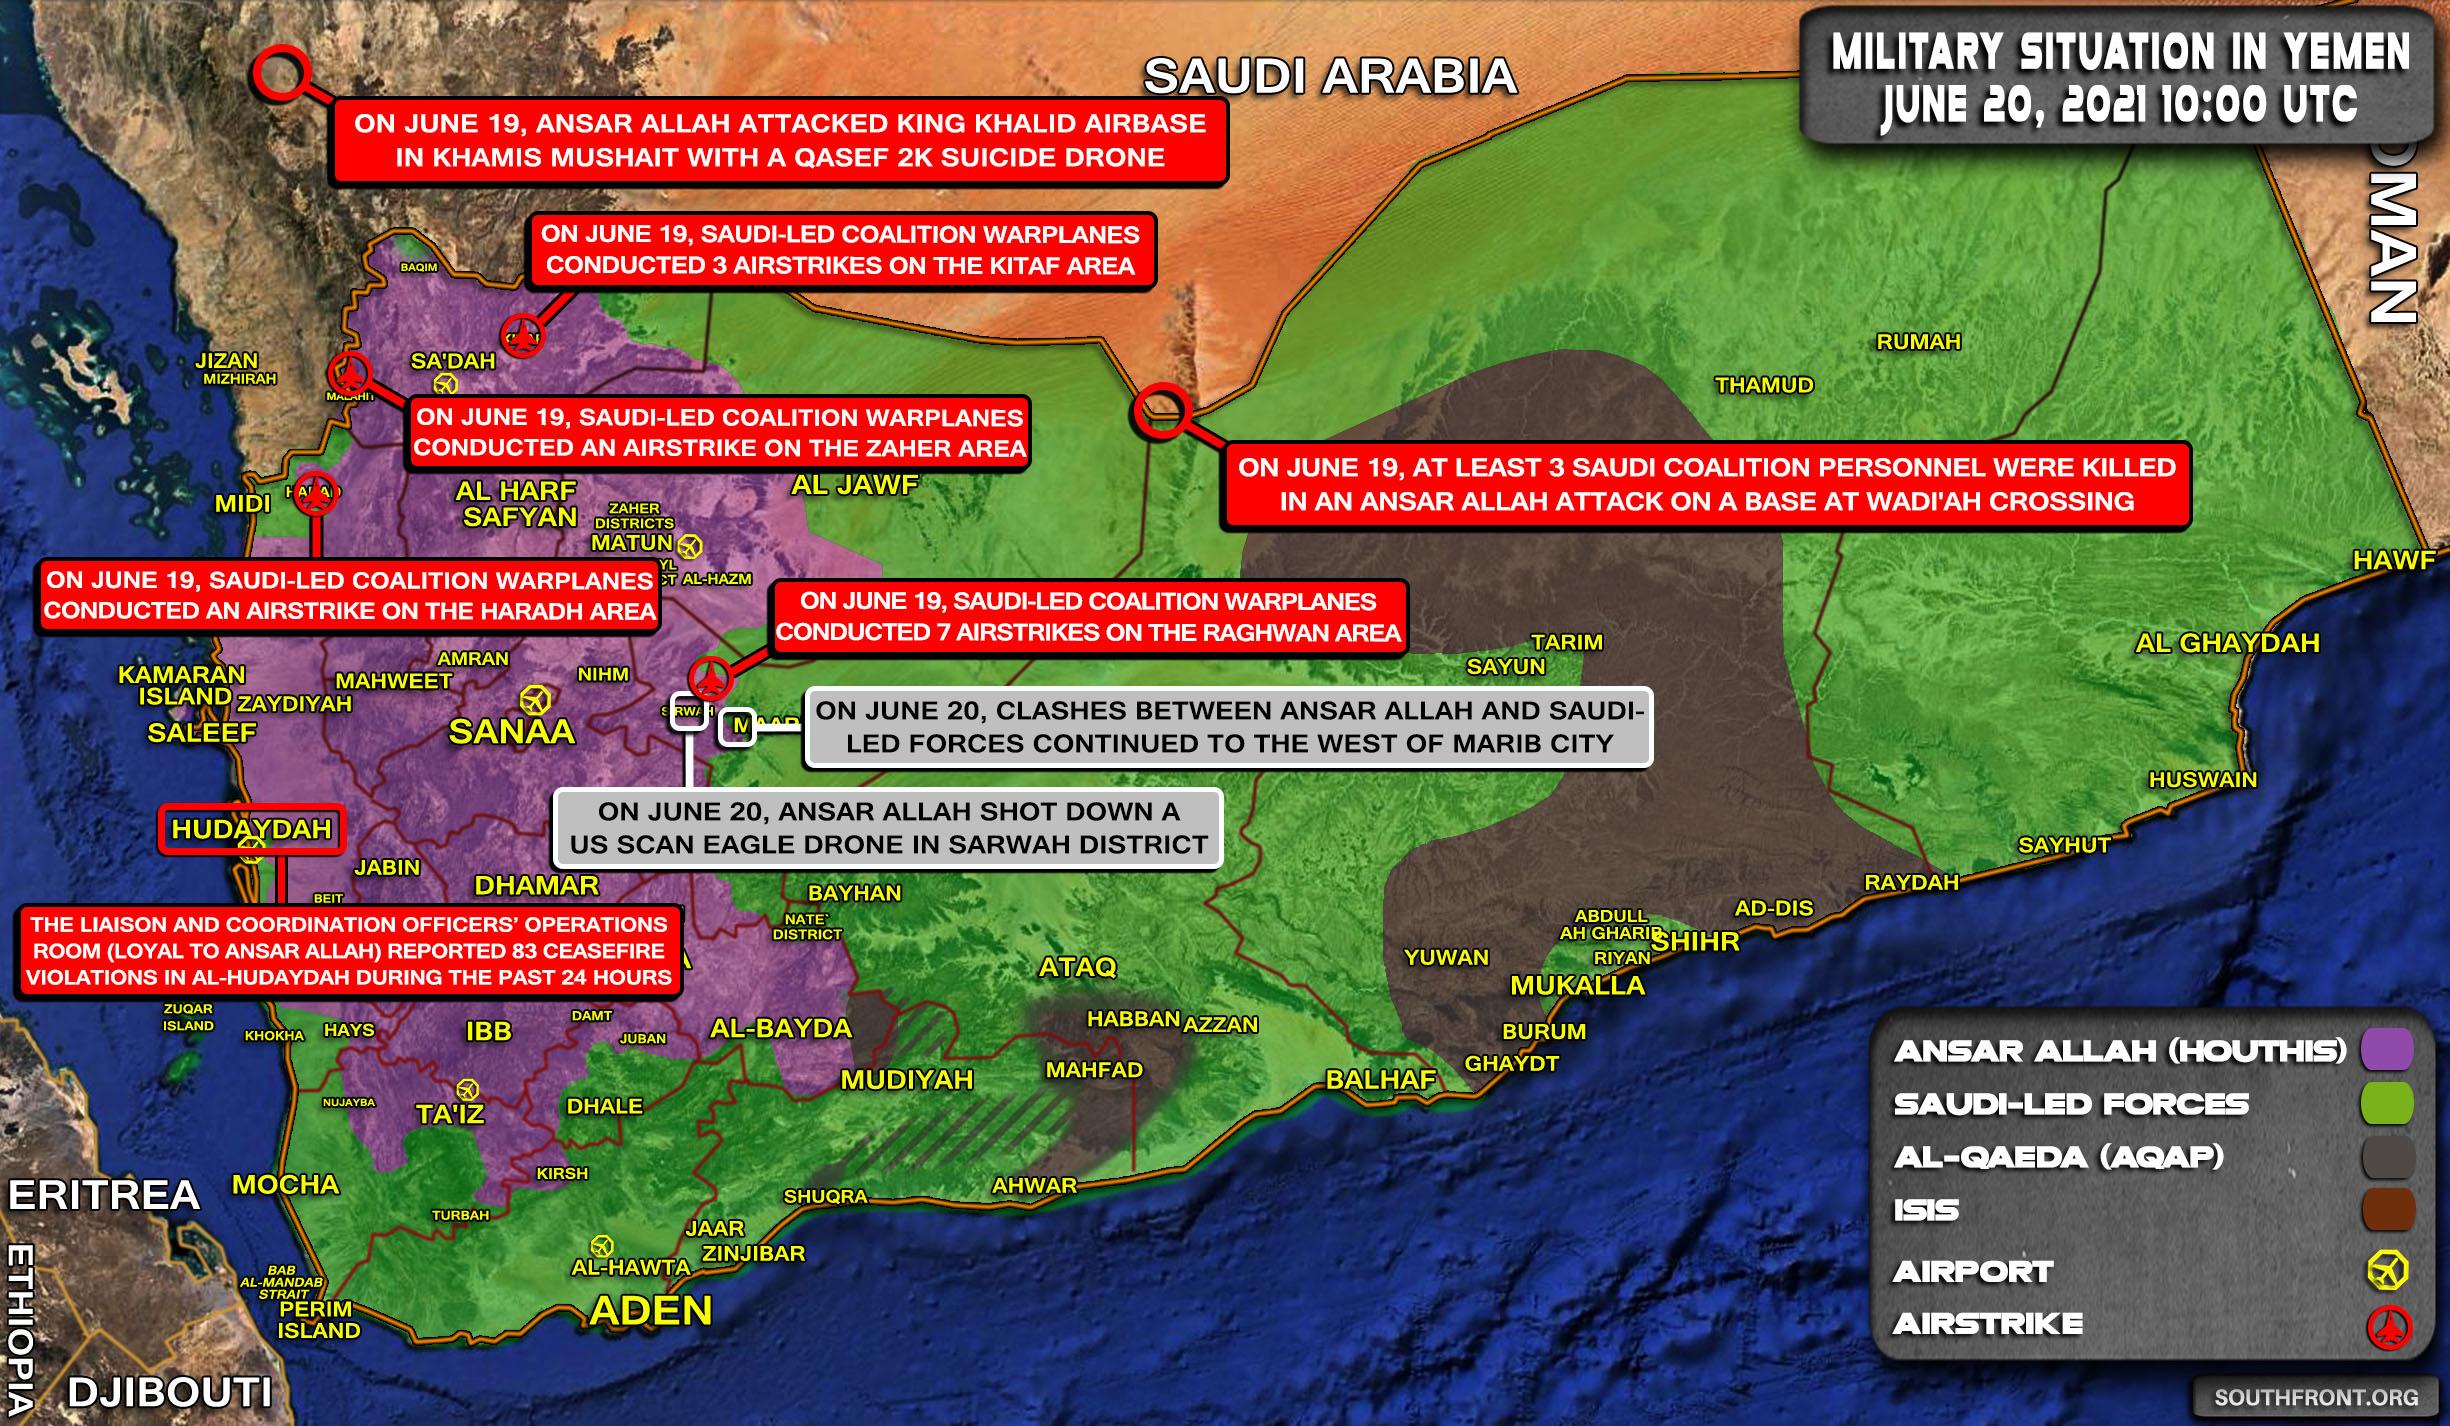 Ansar Allah Kill Saudi-led Coalition Personnel During Attack On Border Crossing Base